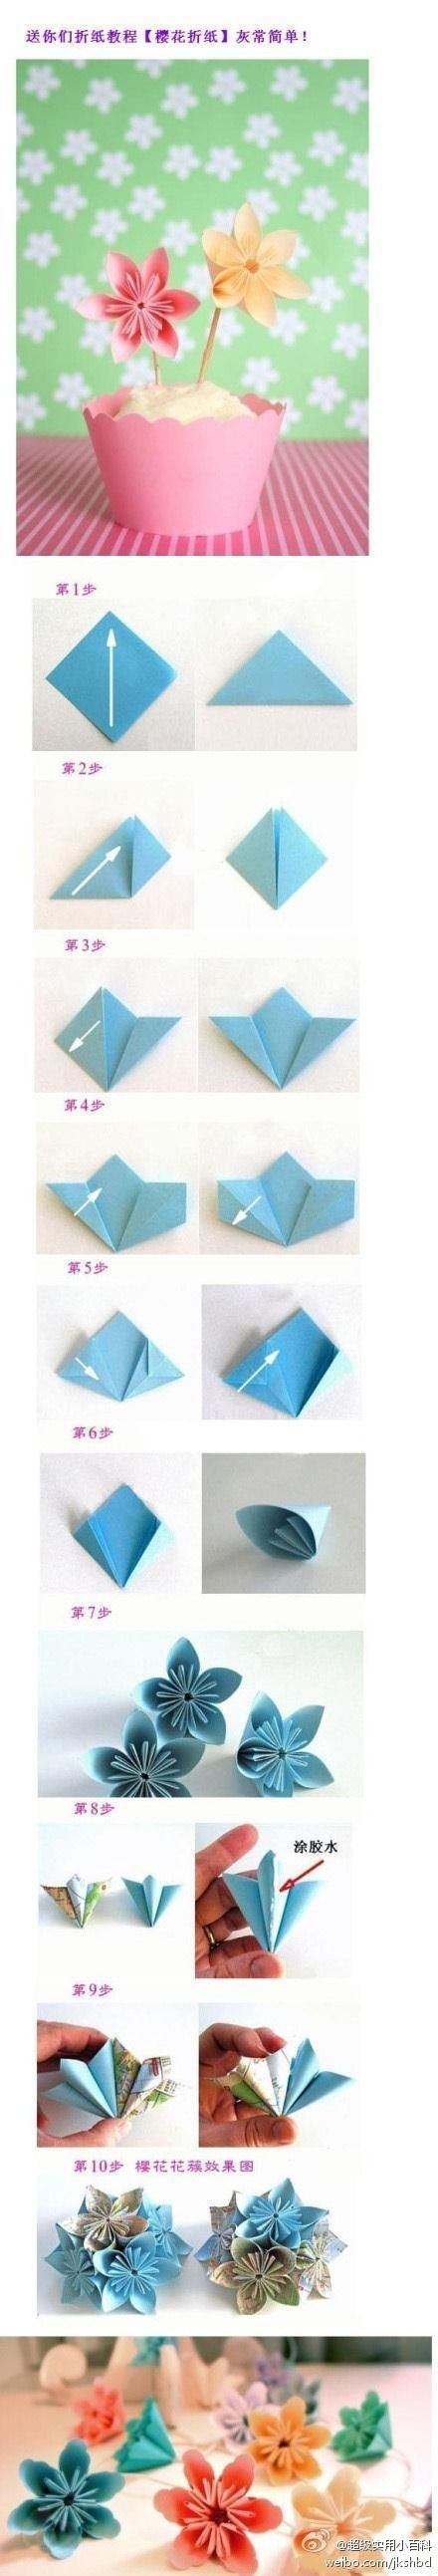 flowerChristmas Paper Folding, Cherries Blossoms, Flower Origami, Paper Flower, Blossoms Origami, Origami Flower, Flower Folding, Flower Tutorial, Flower Diy